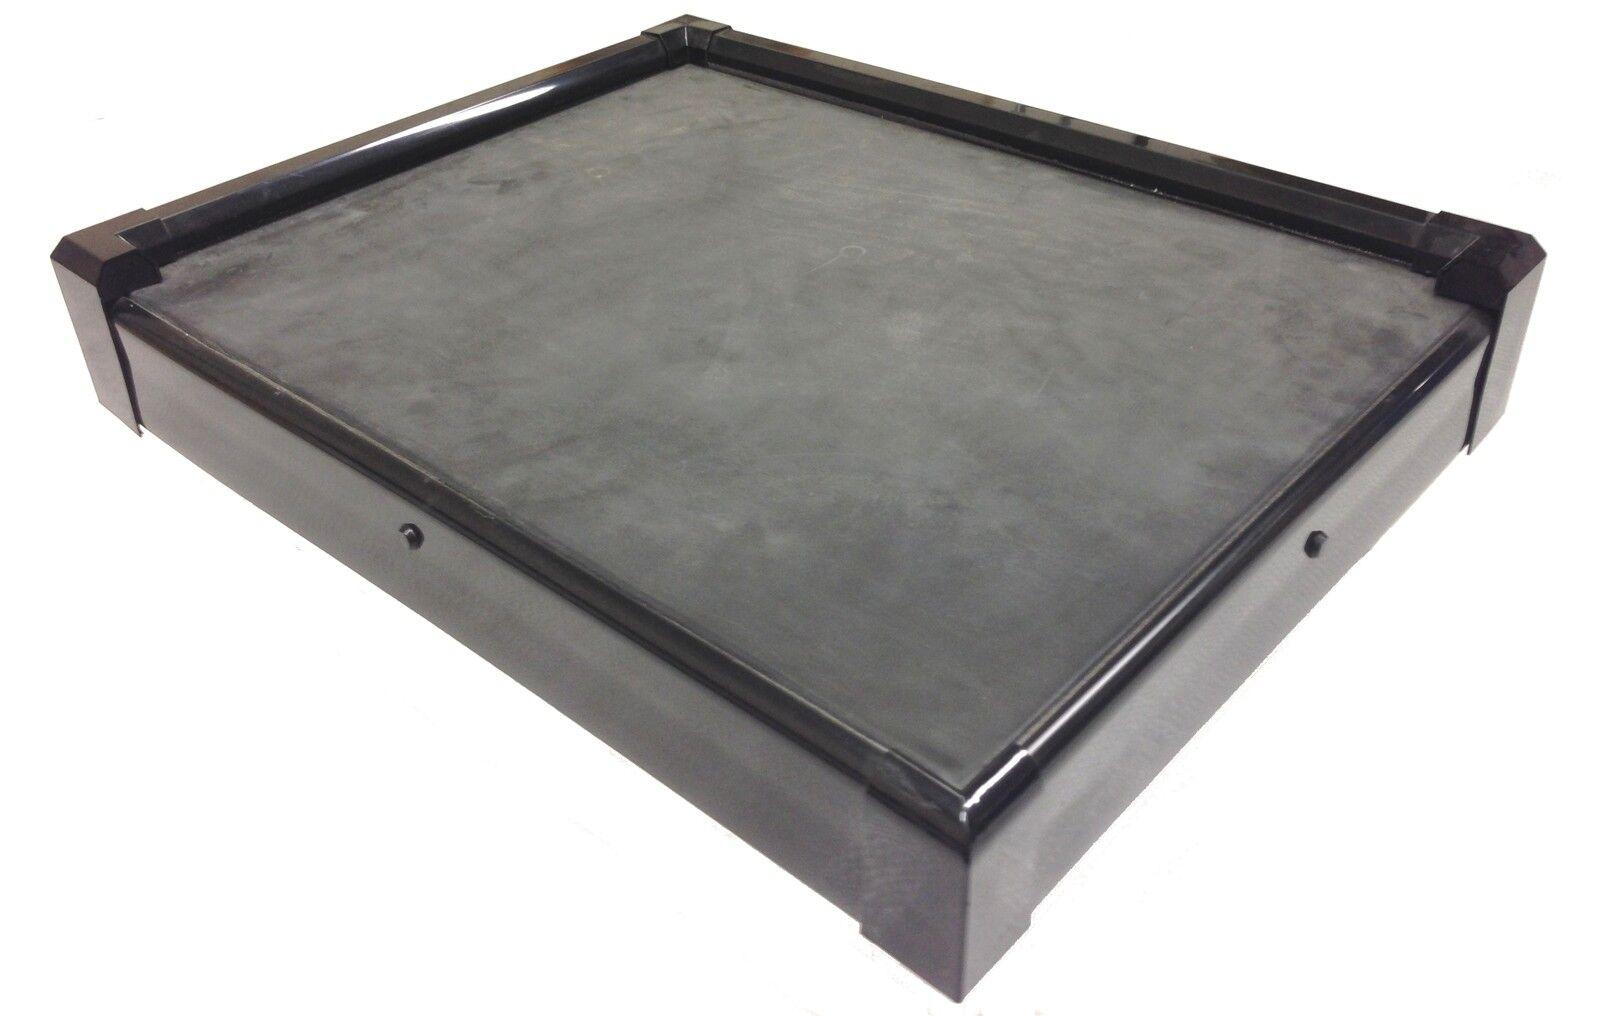 Gutter Drip Trim For Epdm Rubber Roofing U Pvc 163 16 89